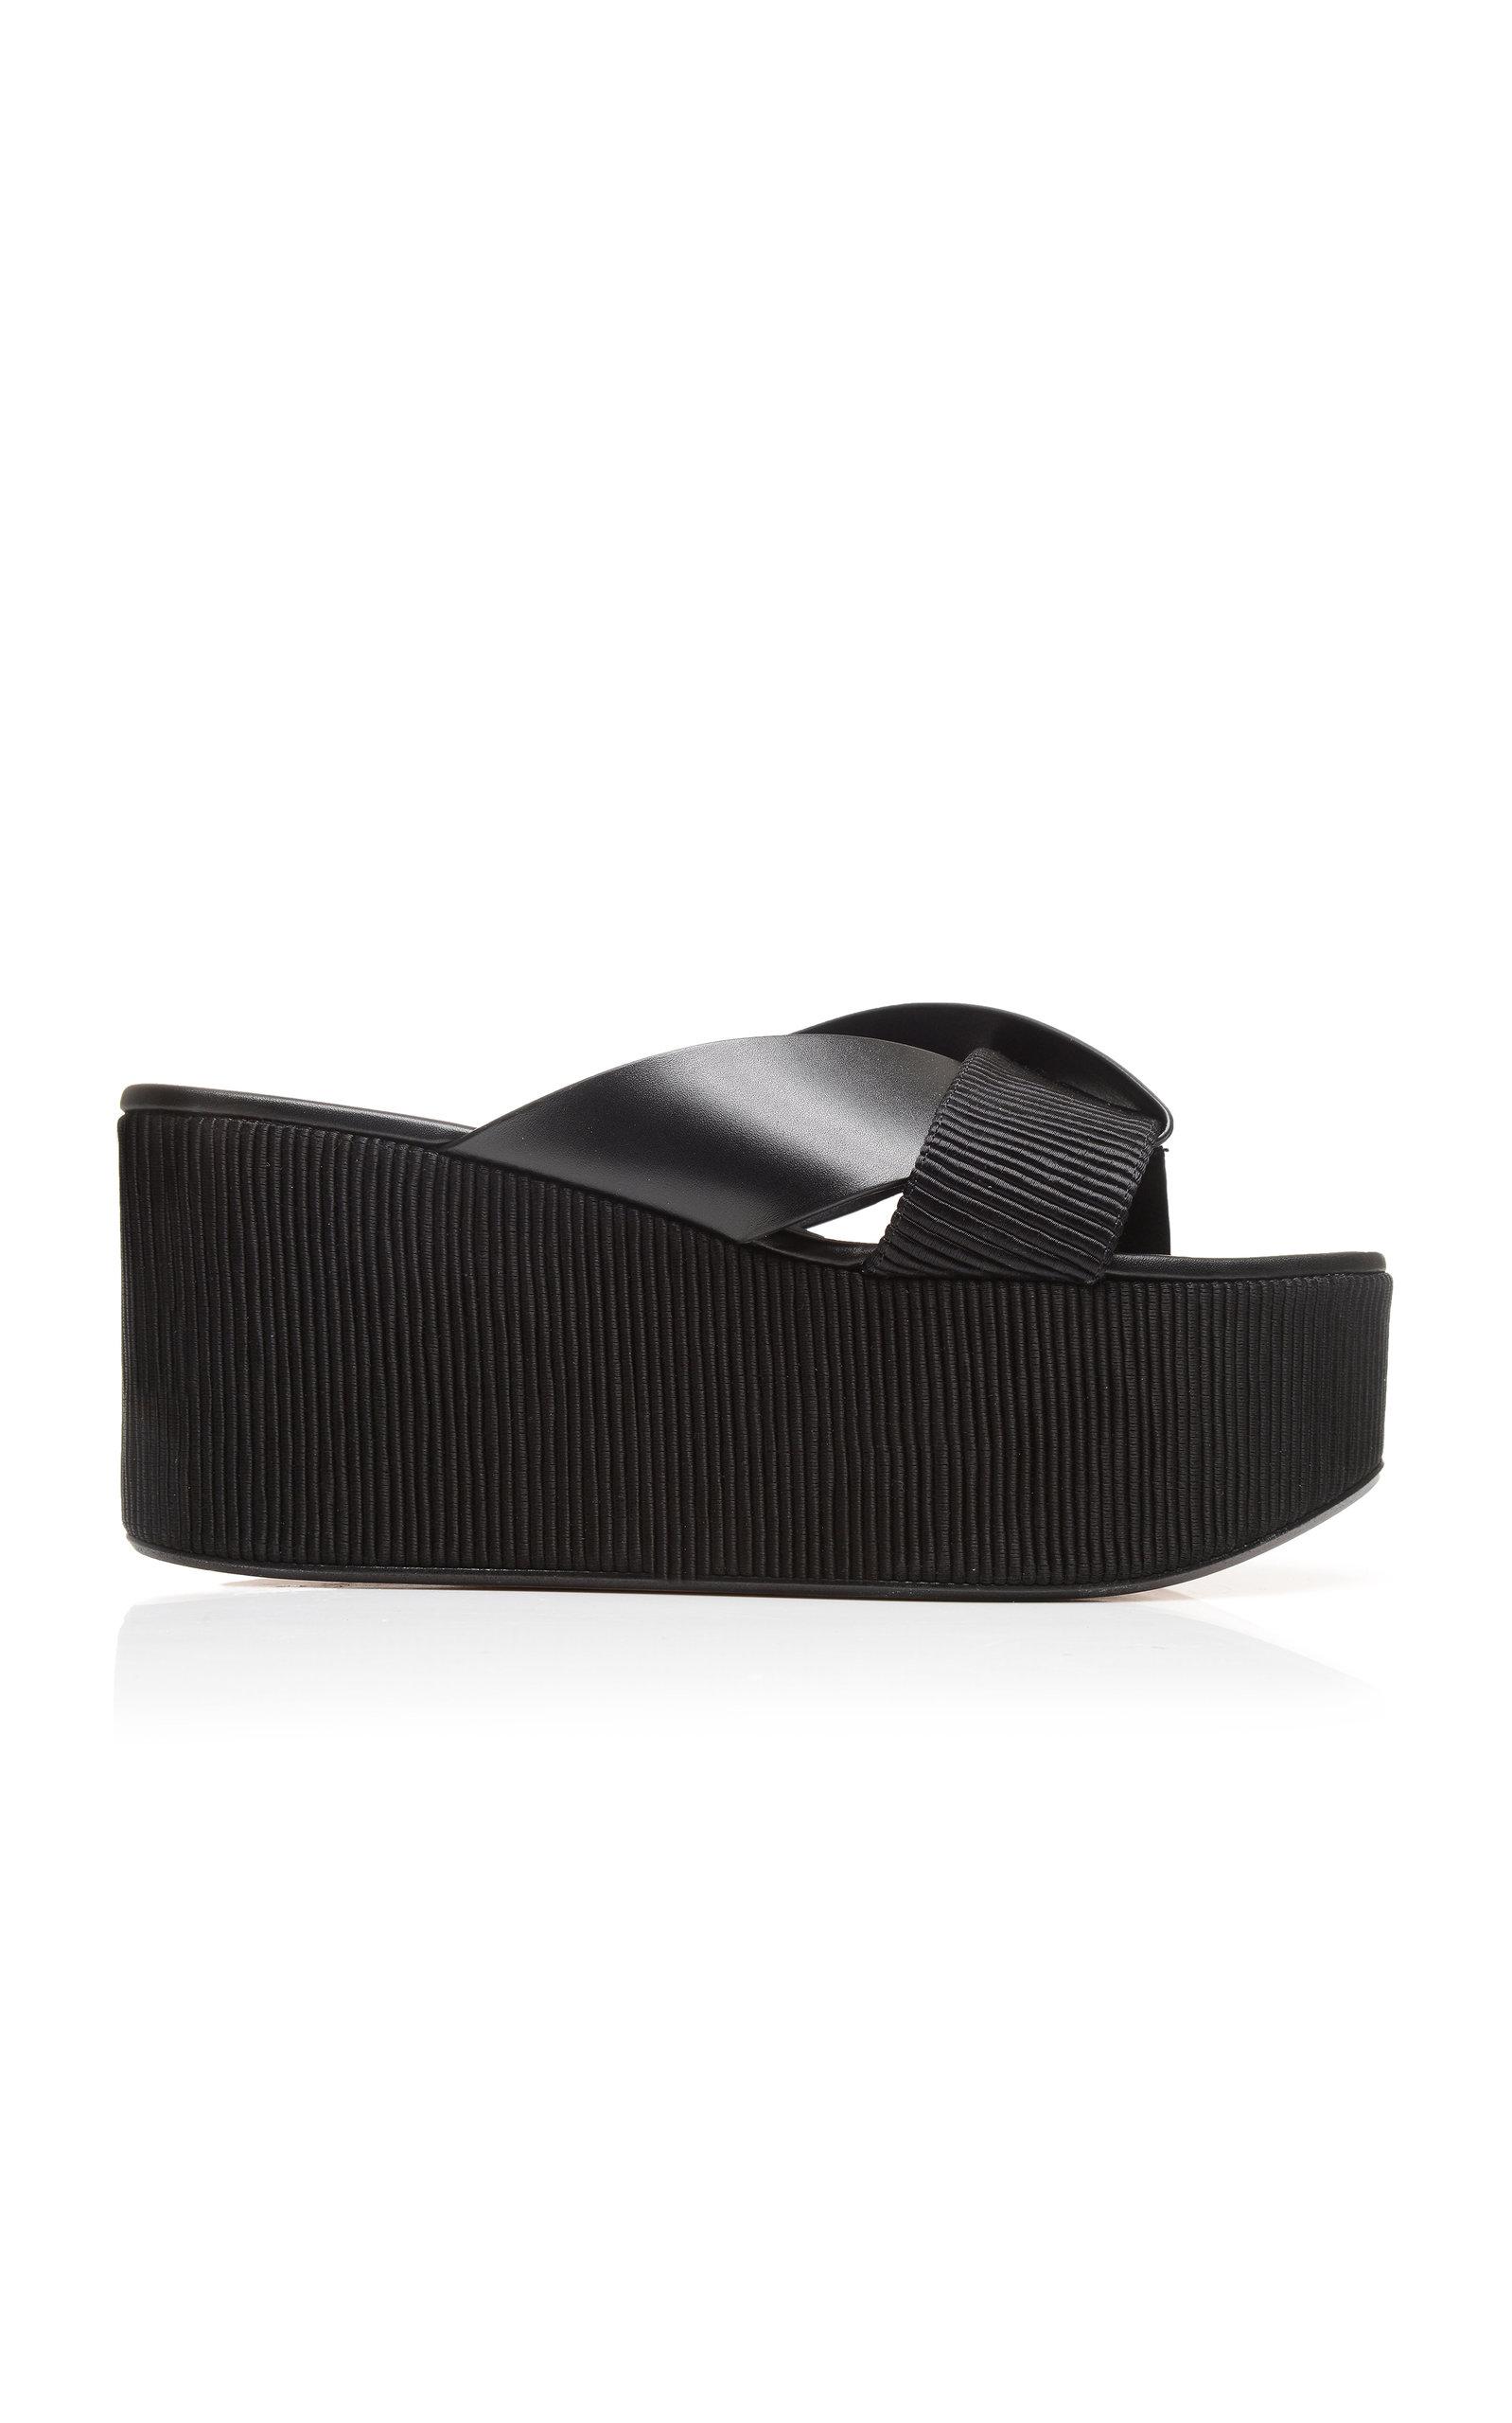 ANDREA GOMEZ Elaria Platform Sandal in Black